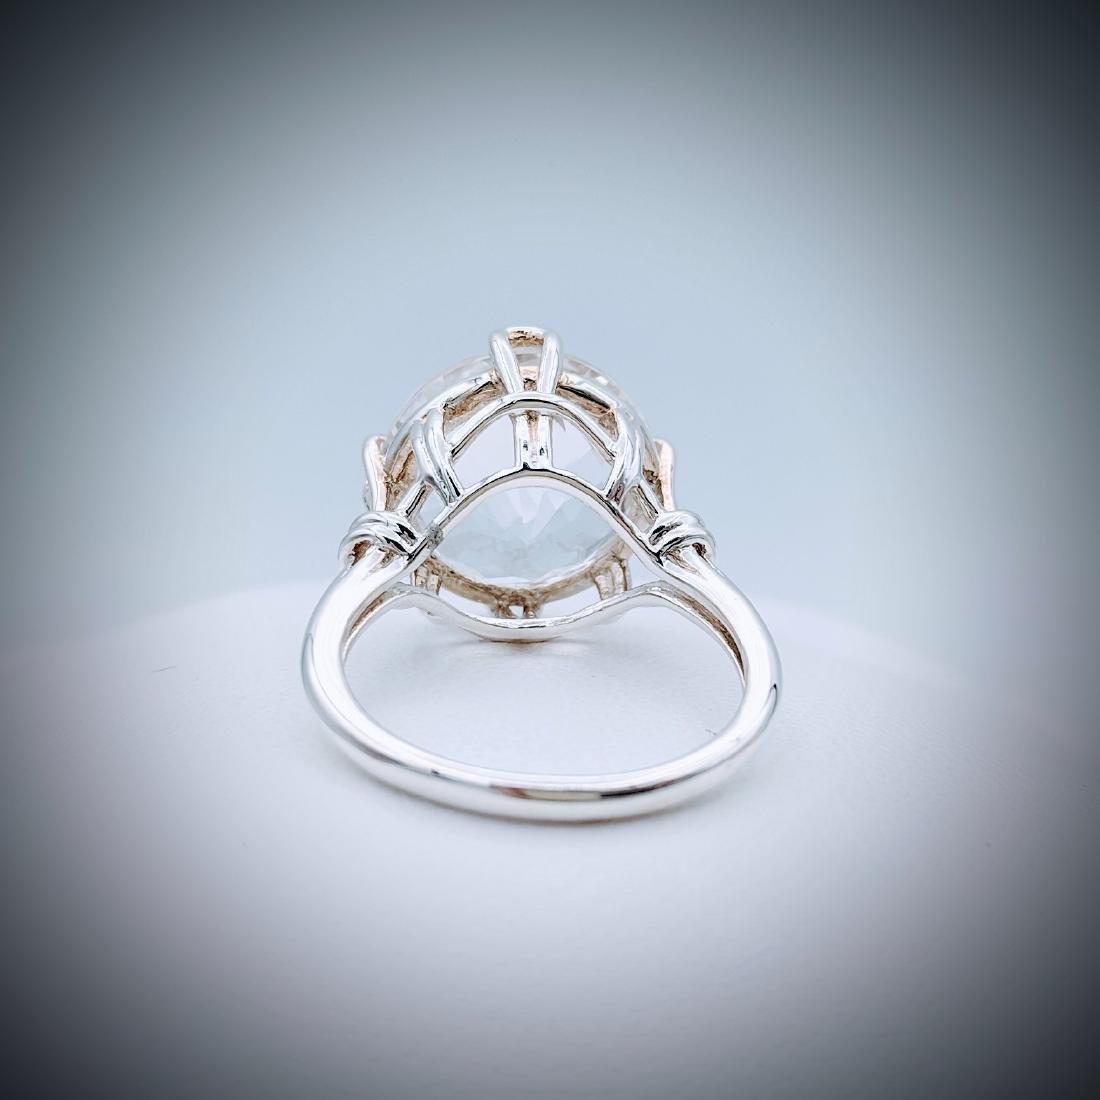 Sterling Silver Sz 7 Goshenite Ring - 2